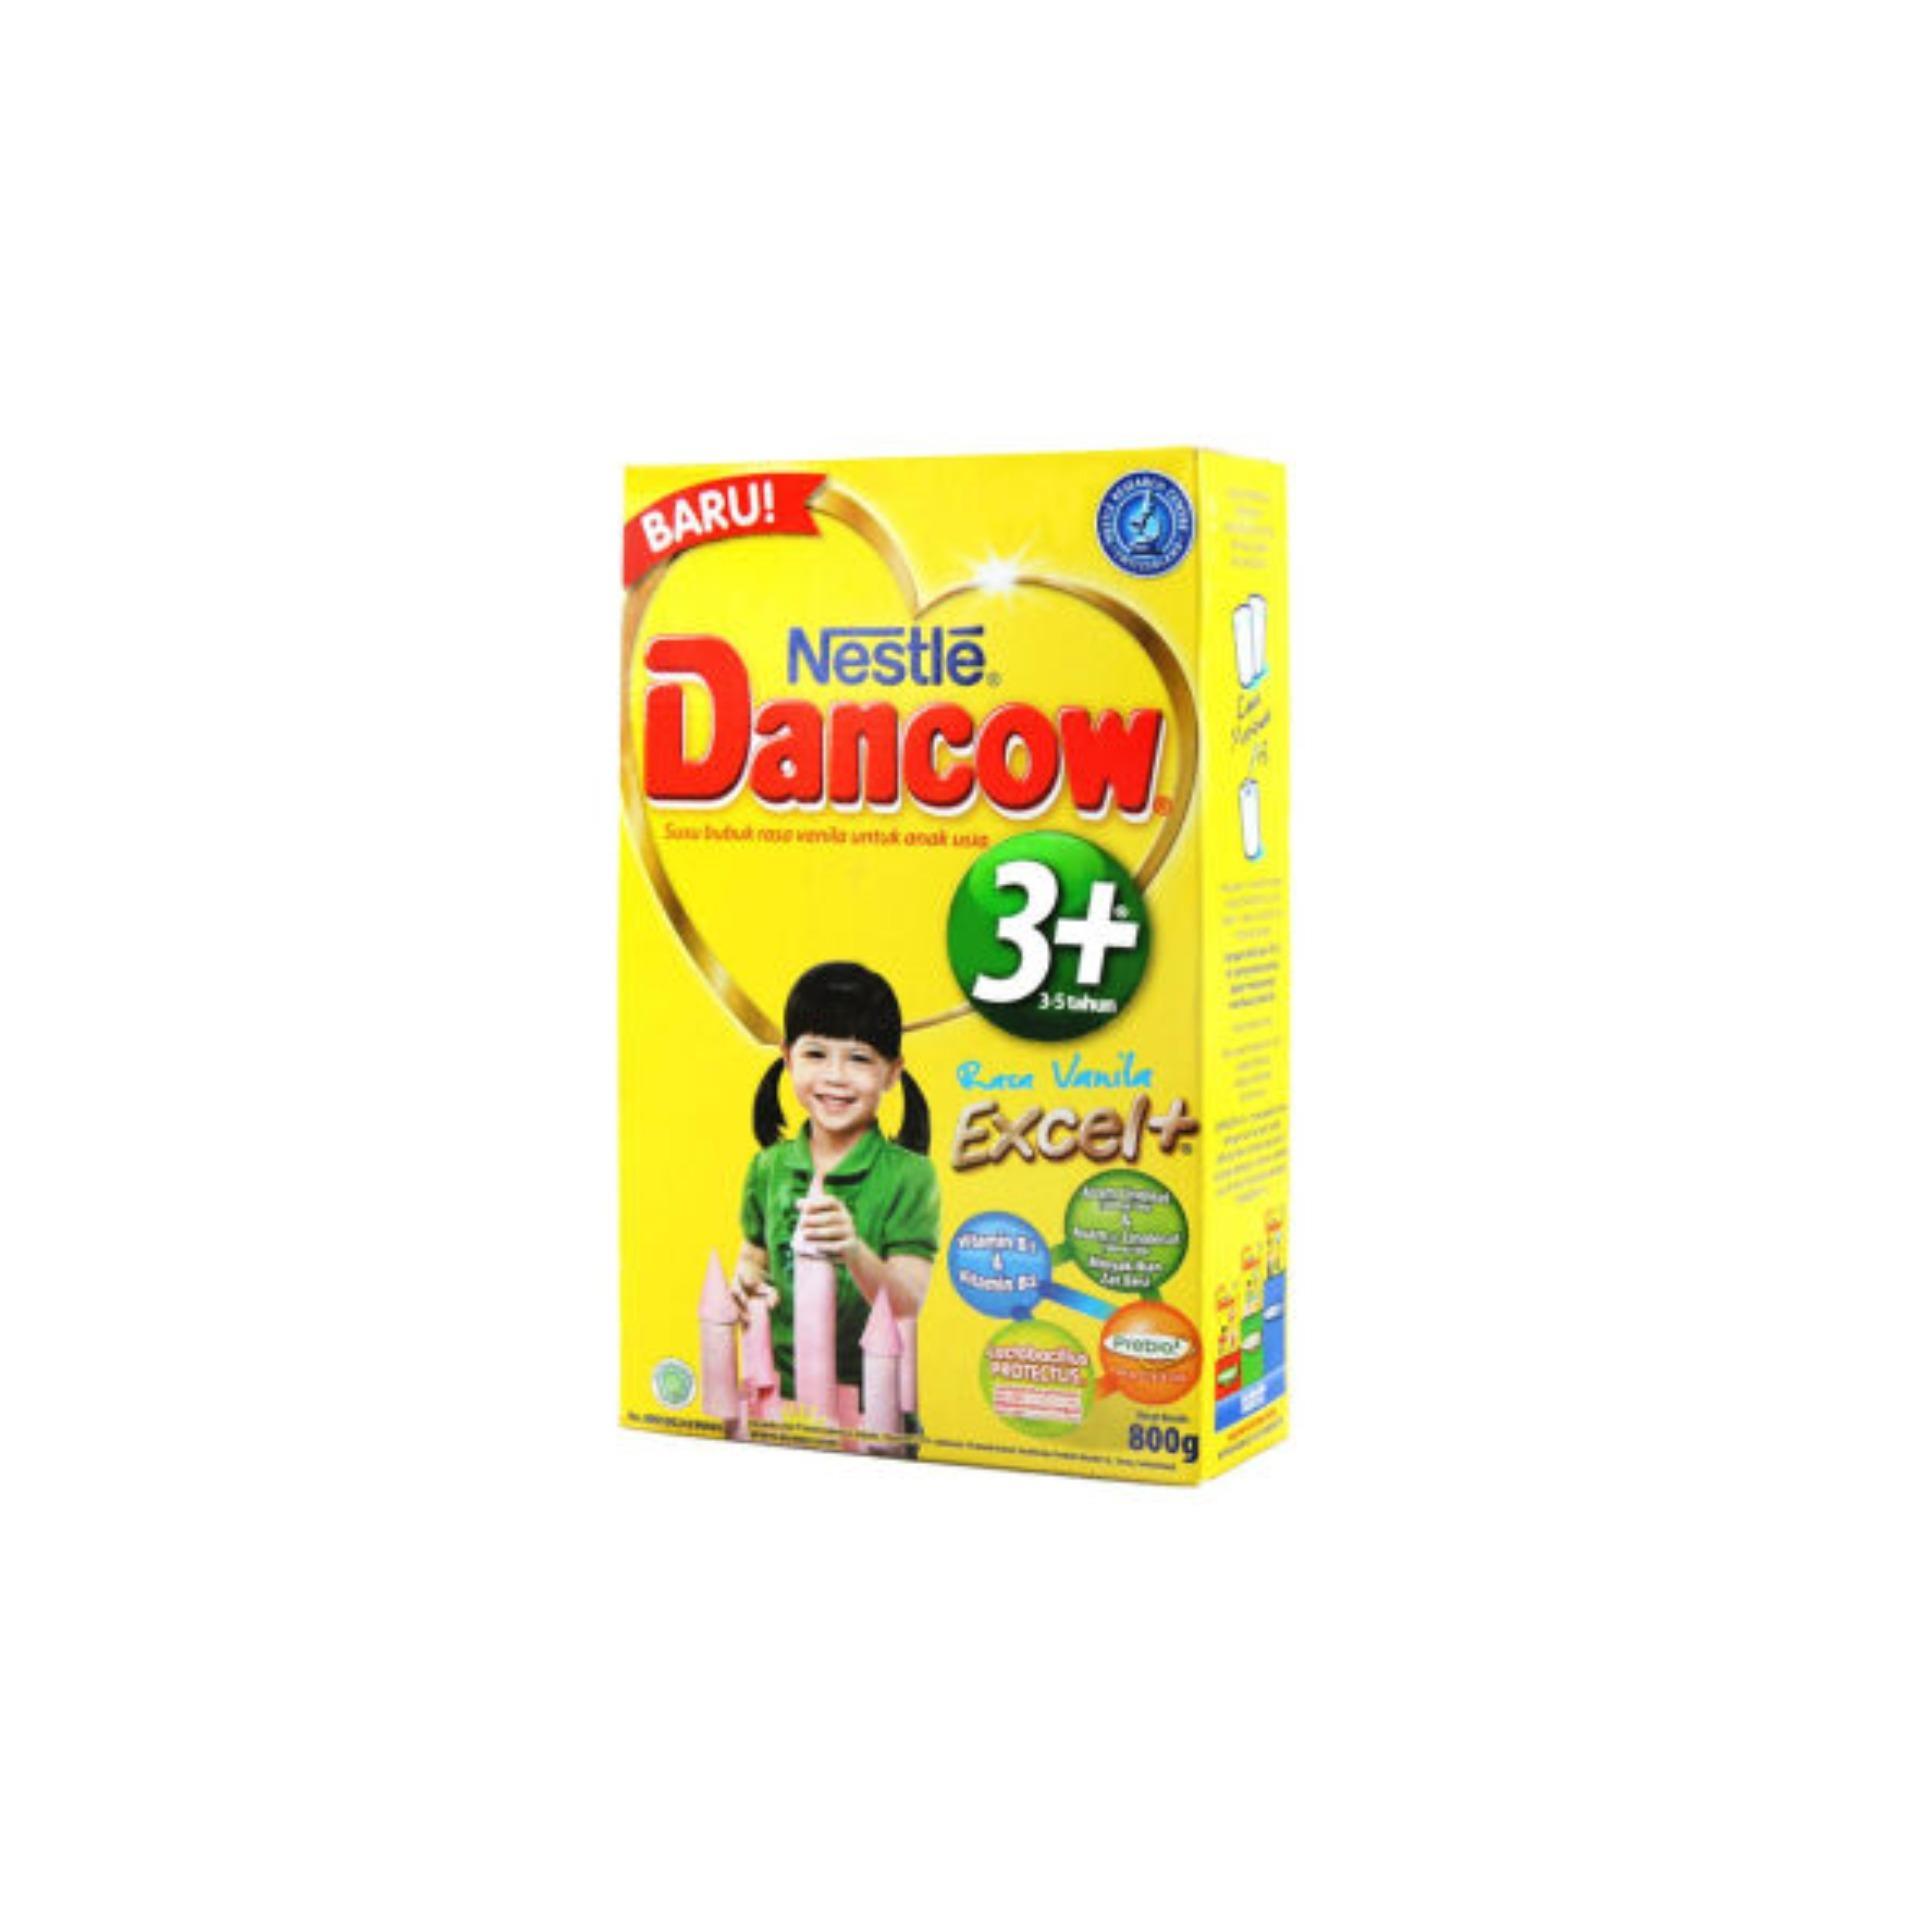 Morinaga Chil Go Strawberry 6x140 Ml Free 1 Action Figure Chila Vanilla  2 Botol Isi 800gr Dancow 3 Vanila Susu Box 800g 800 G